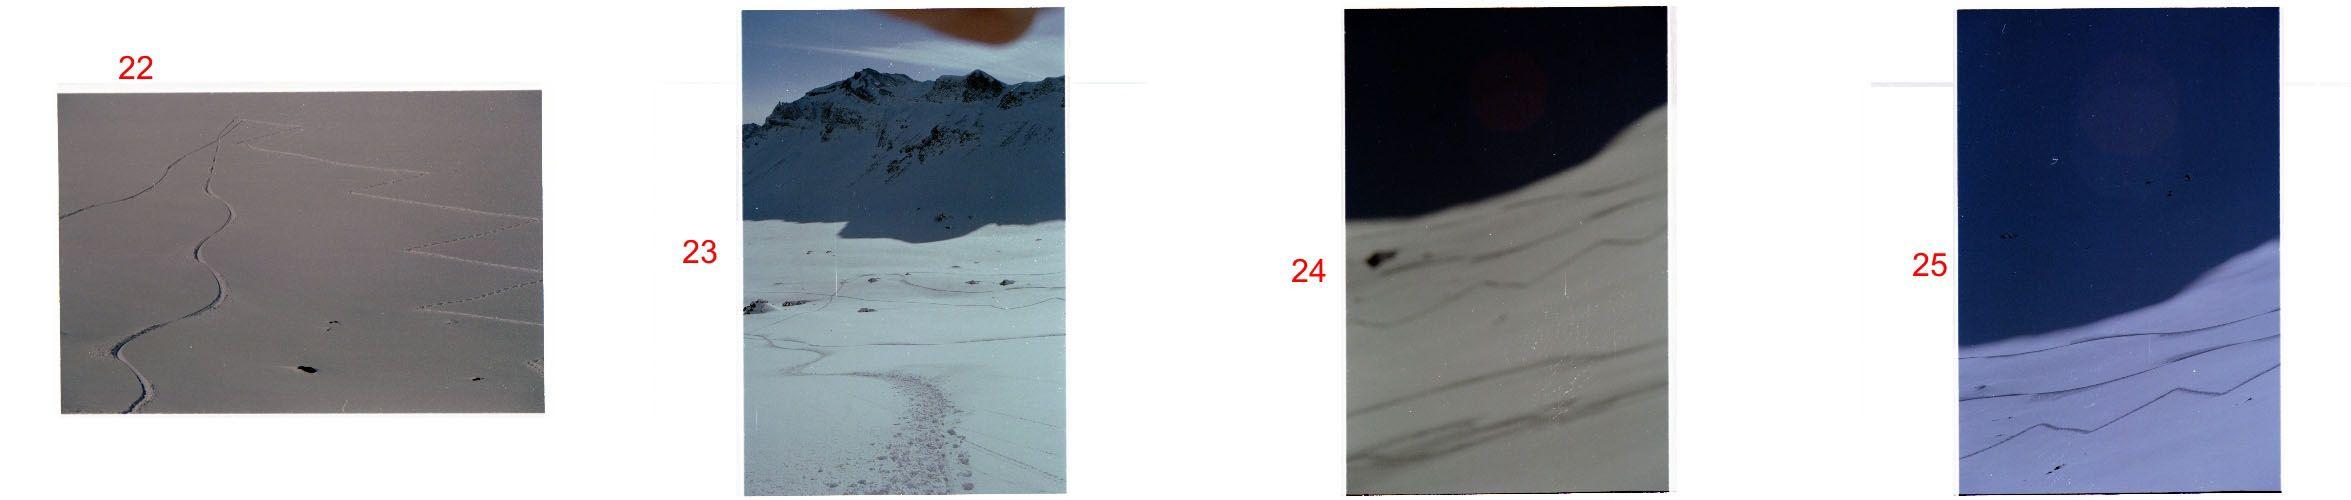 22-27-klipp.jpg